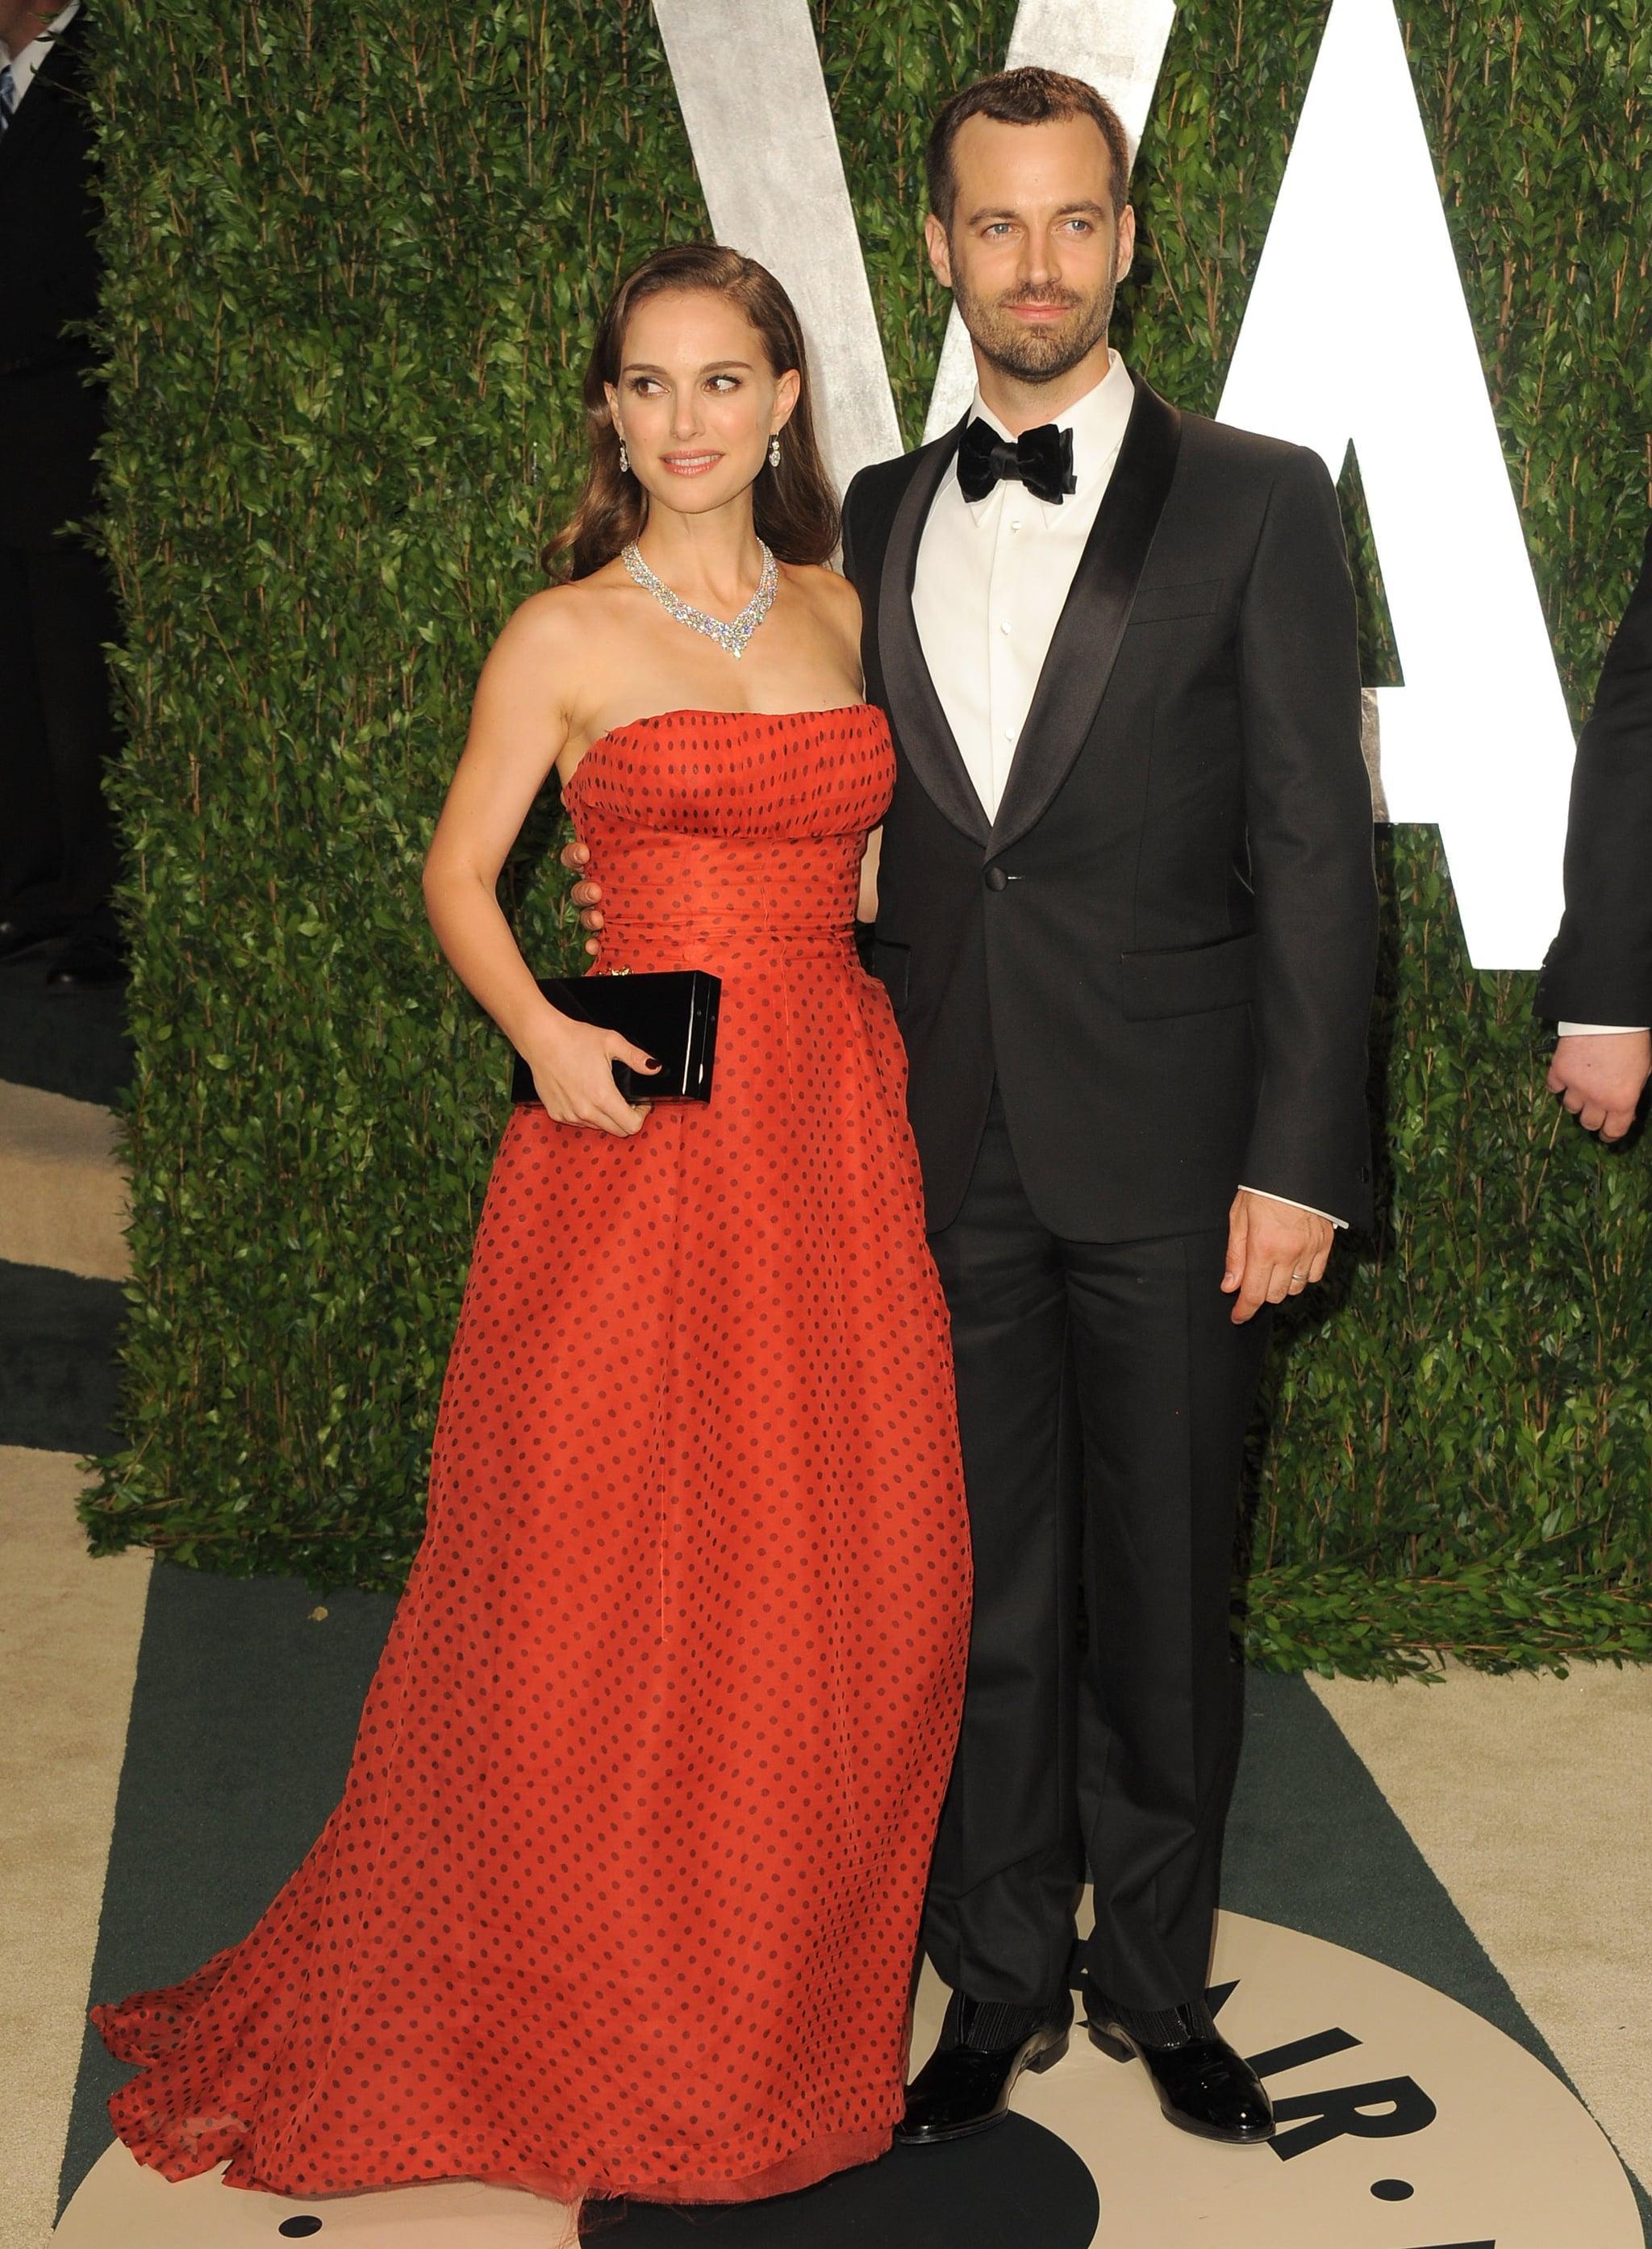 Natalie Portman and Benjamin Millepied strike a pose.